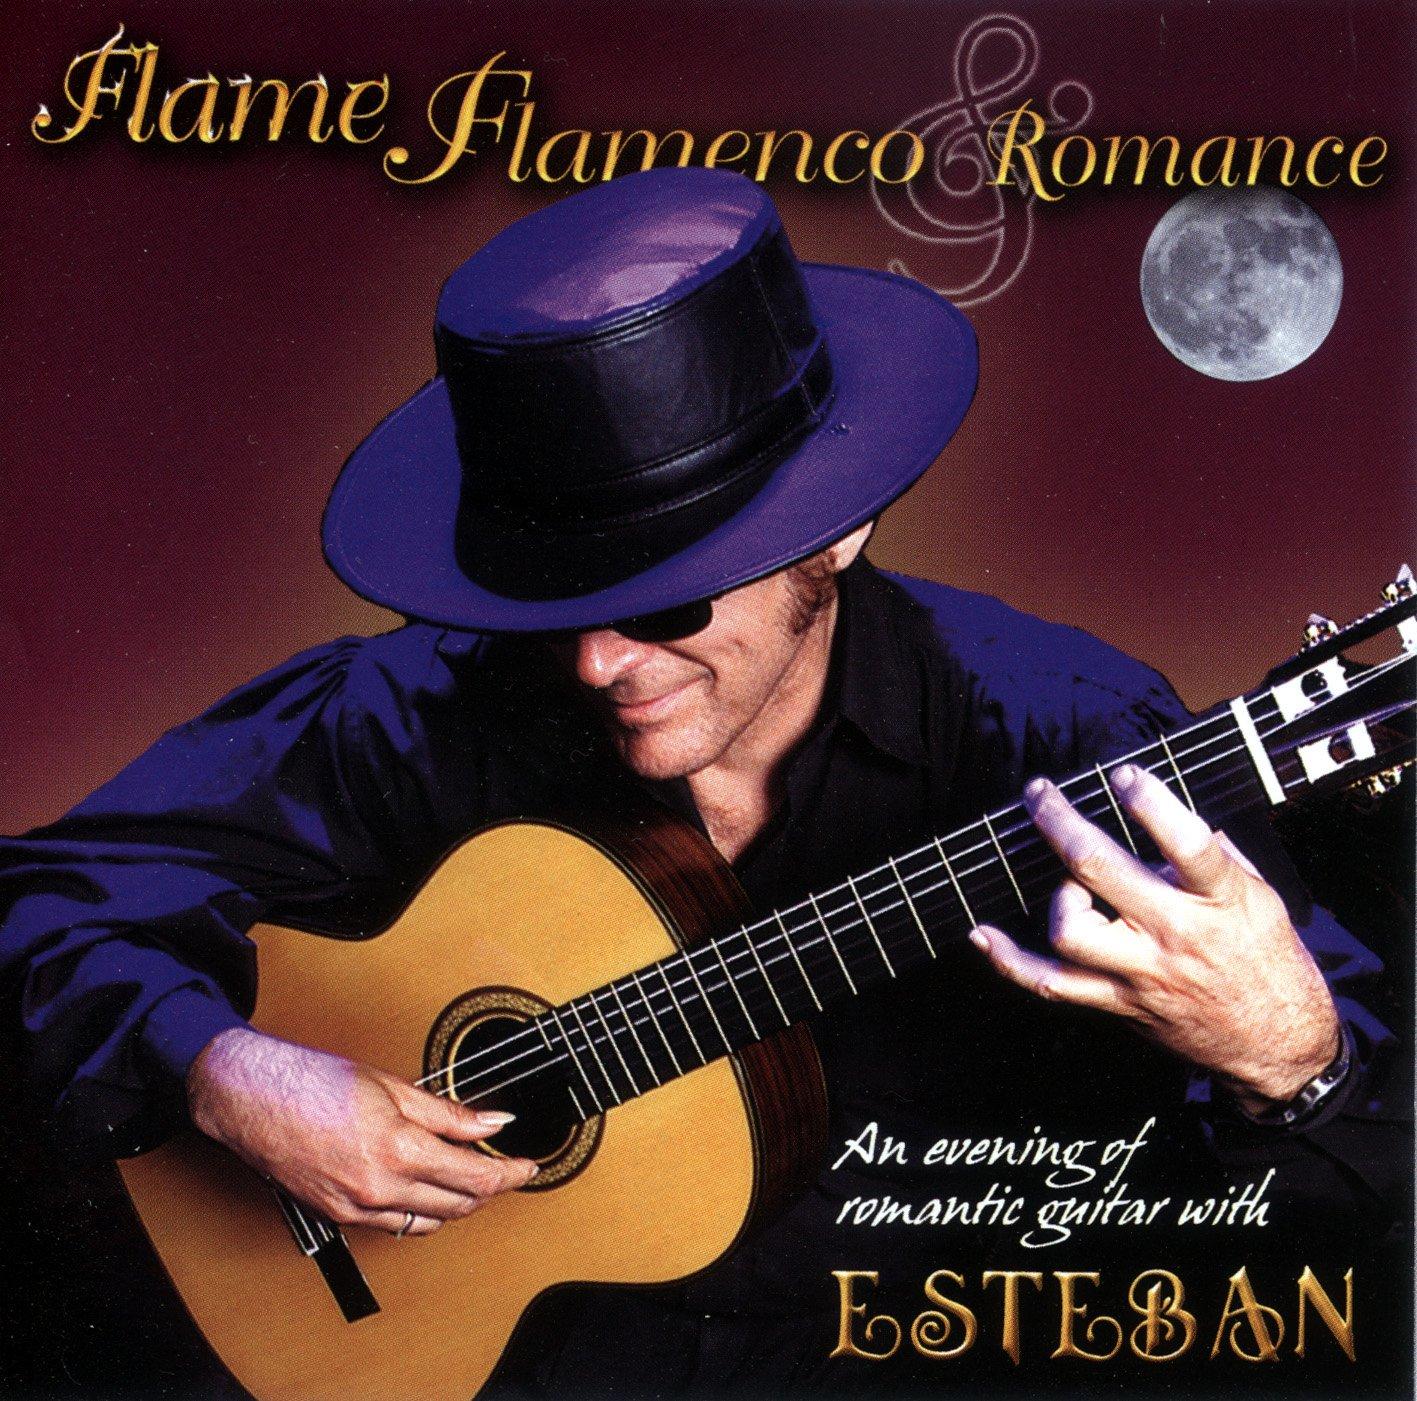 Flame Classic Flamenco Romance 4 years warranty